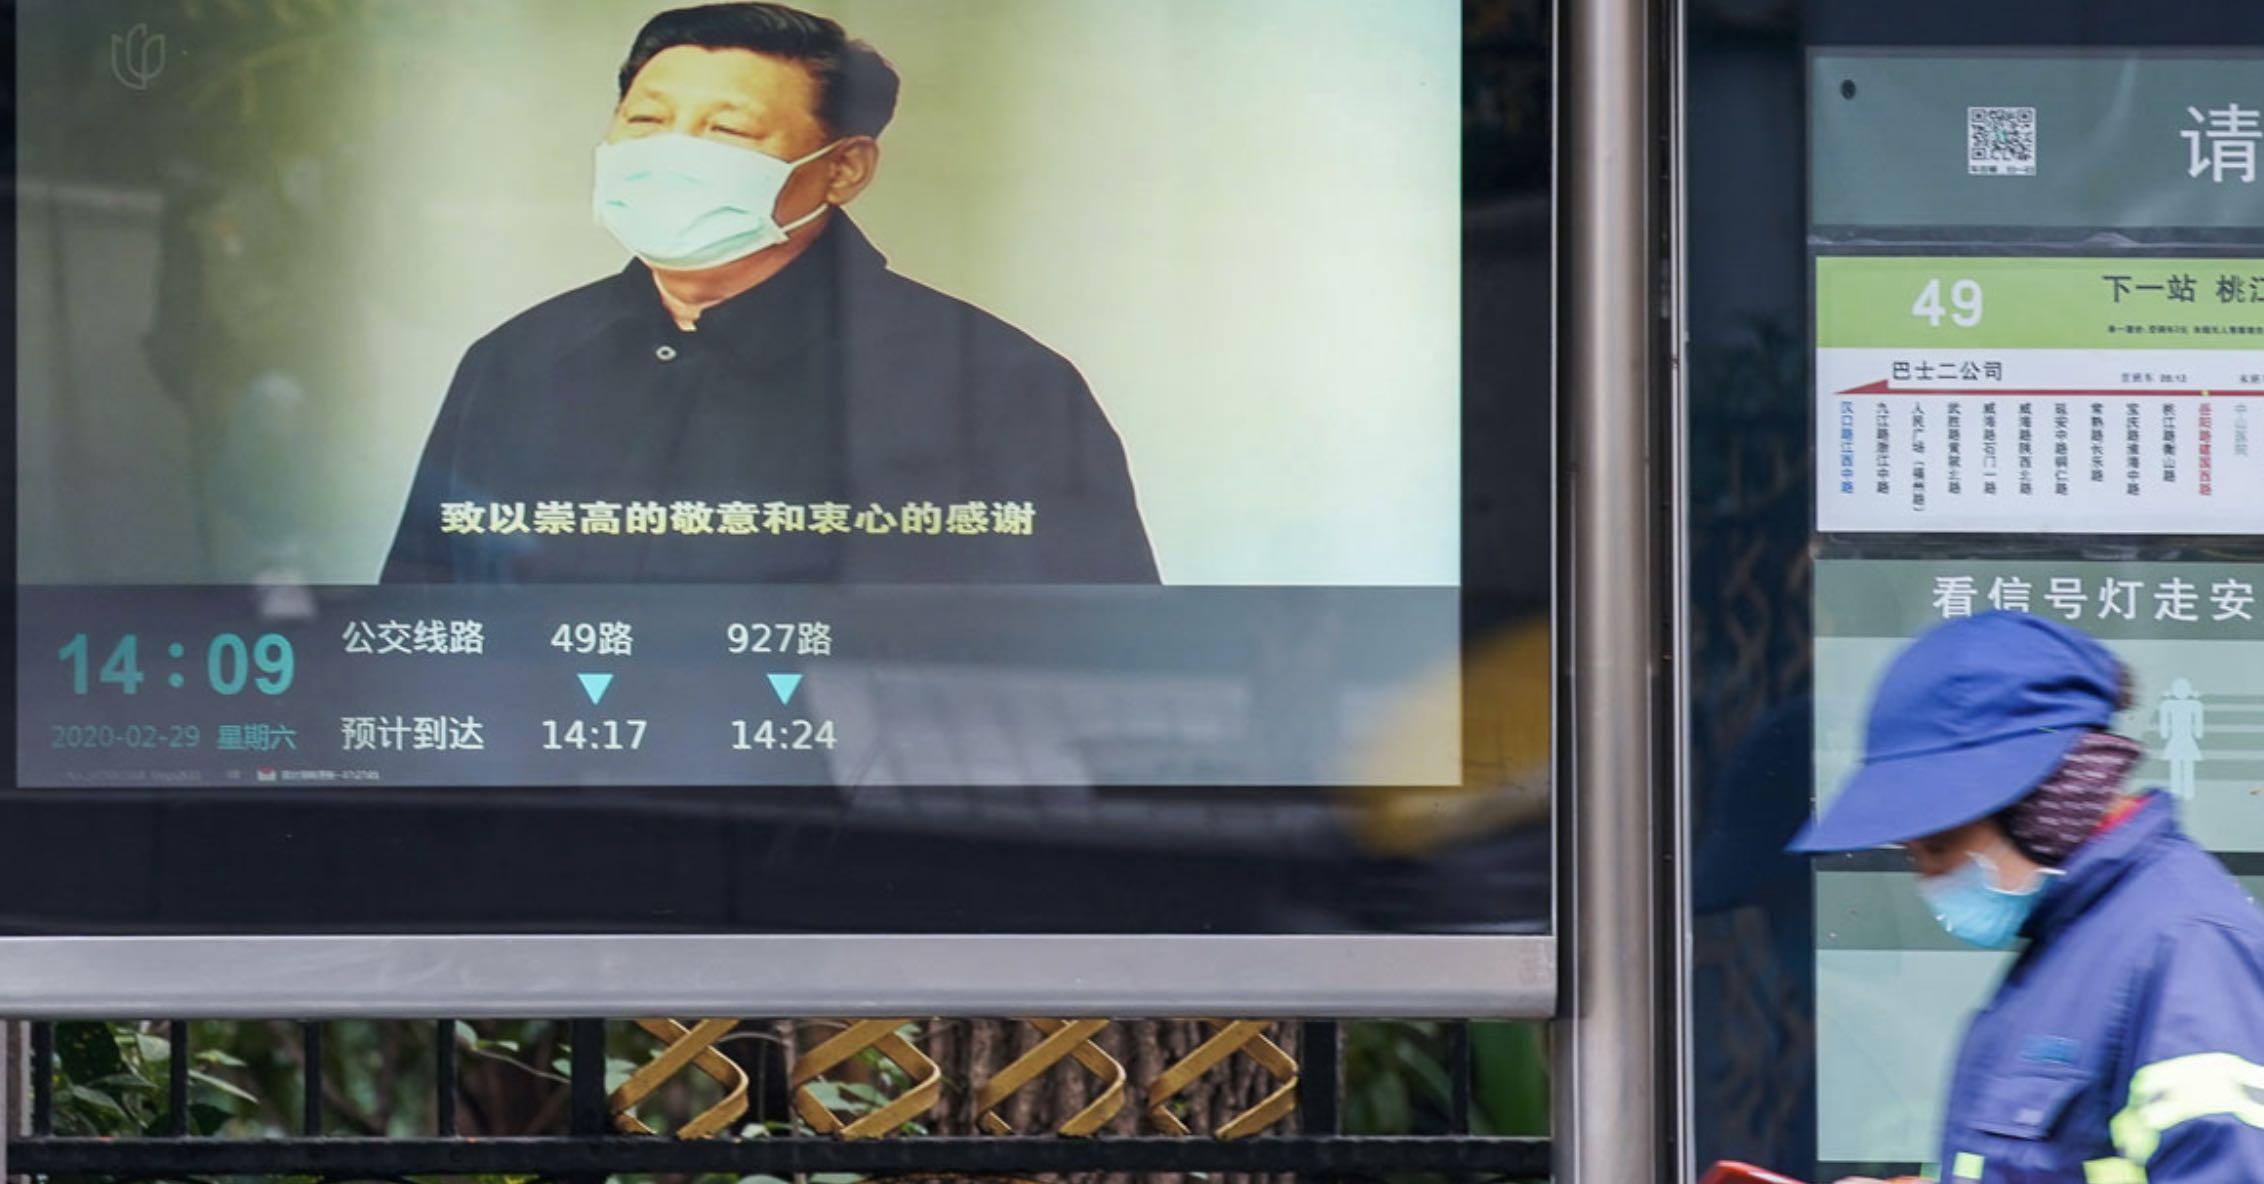 Xi Jinping, Partido Comunista Chino, Responsabilidad de China en la epidemia de coronavirus